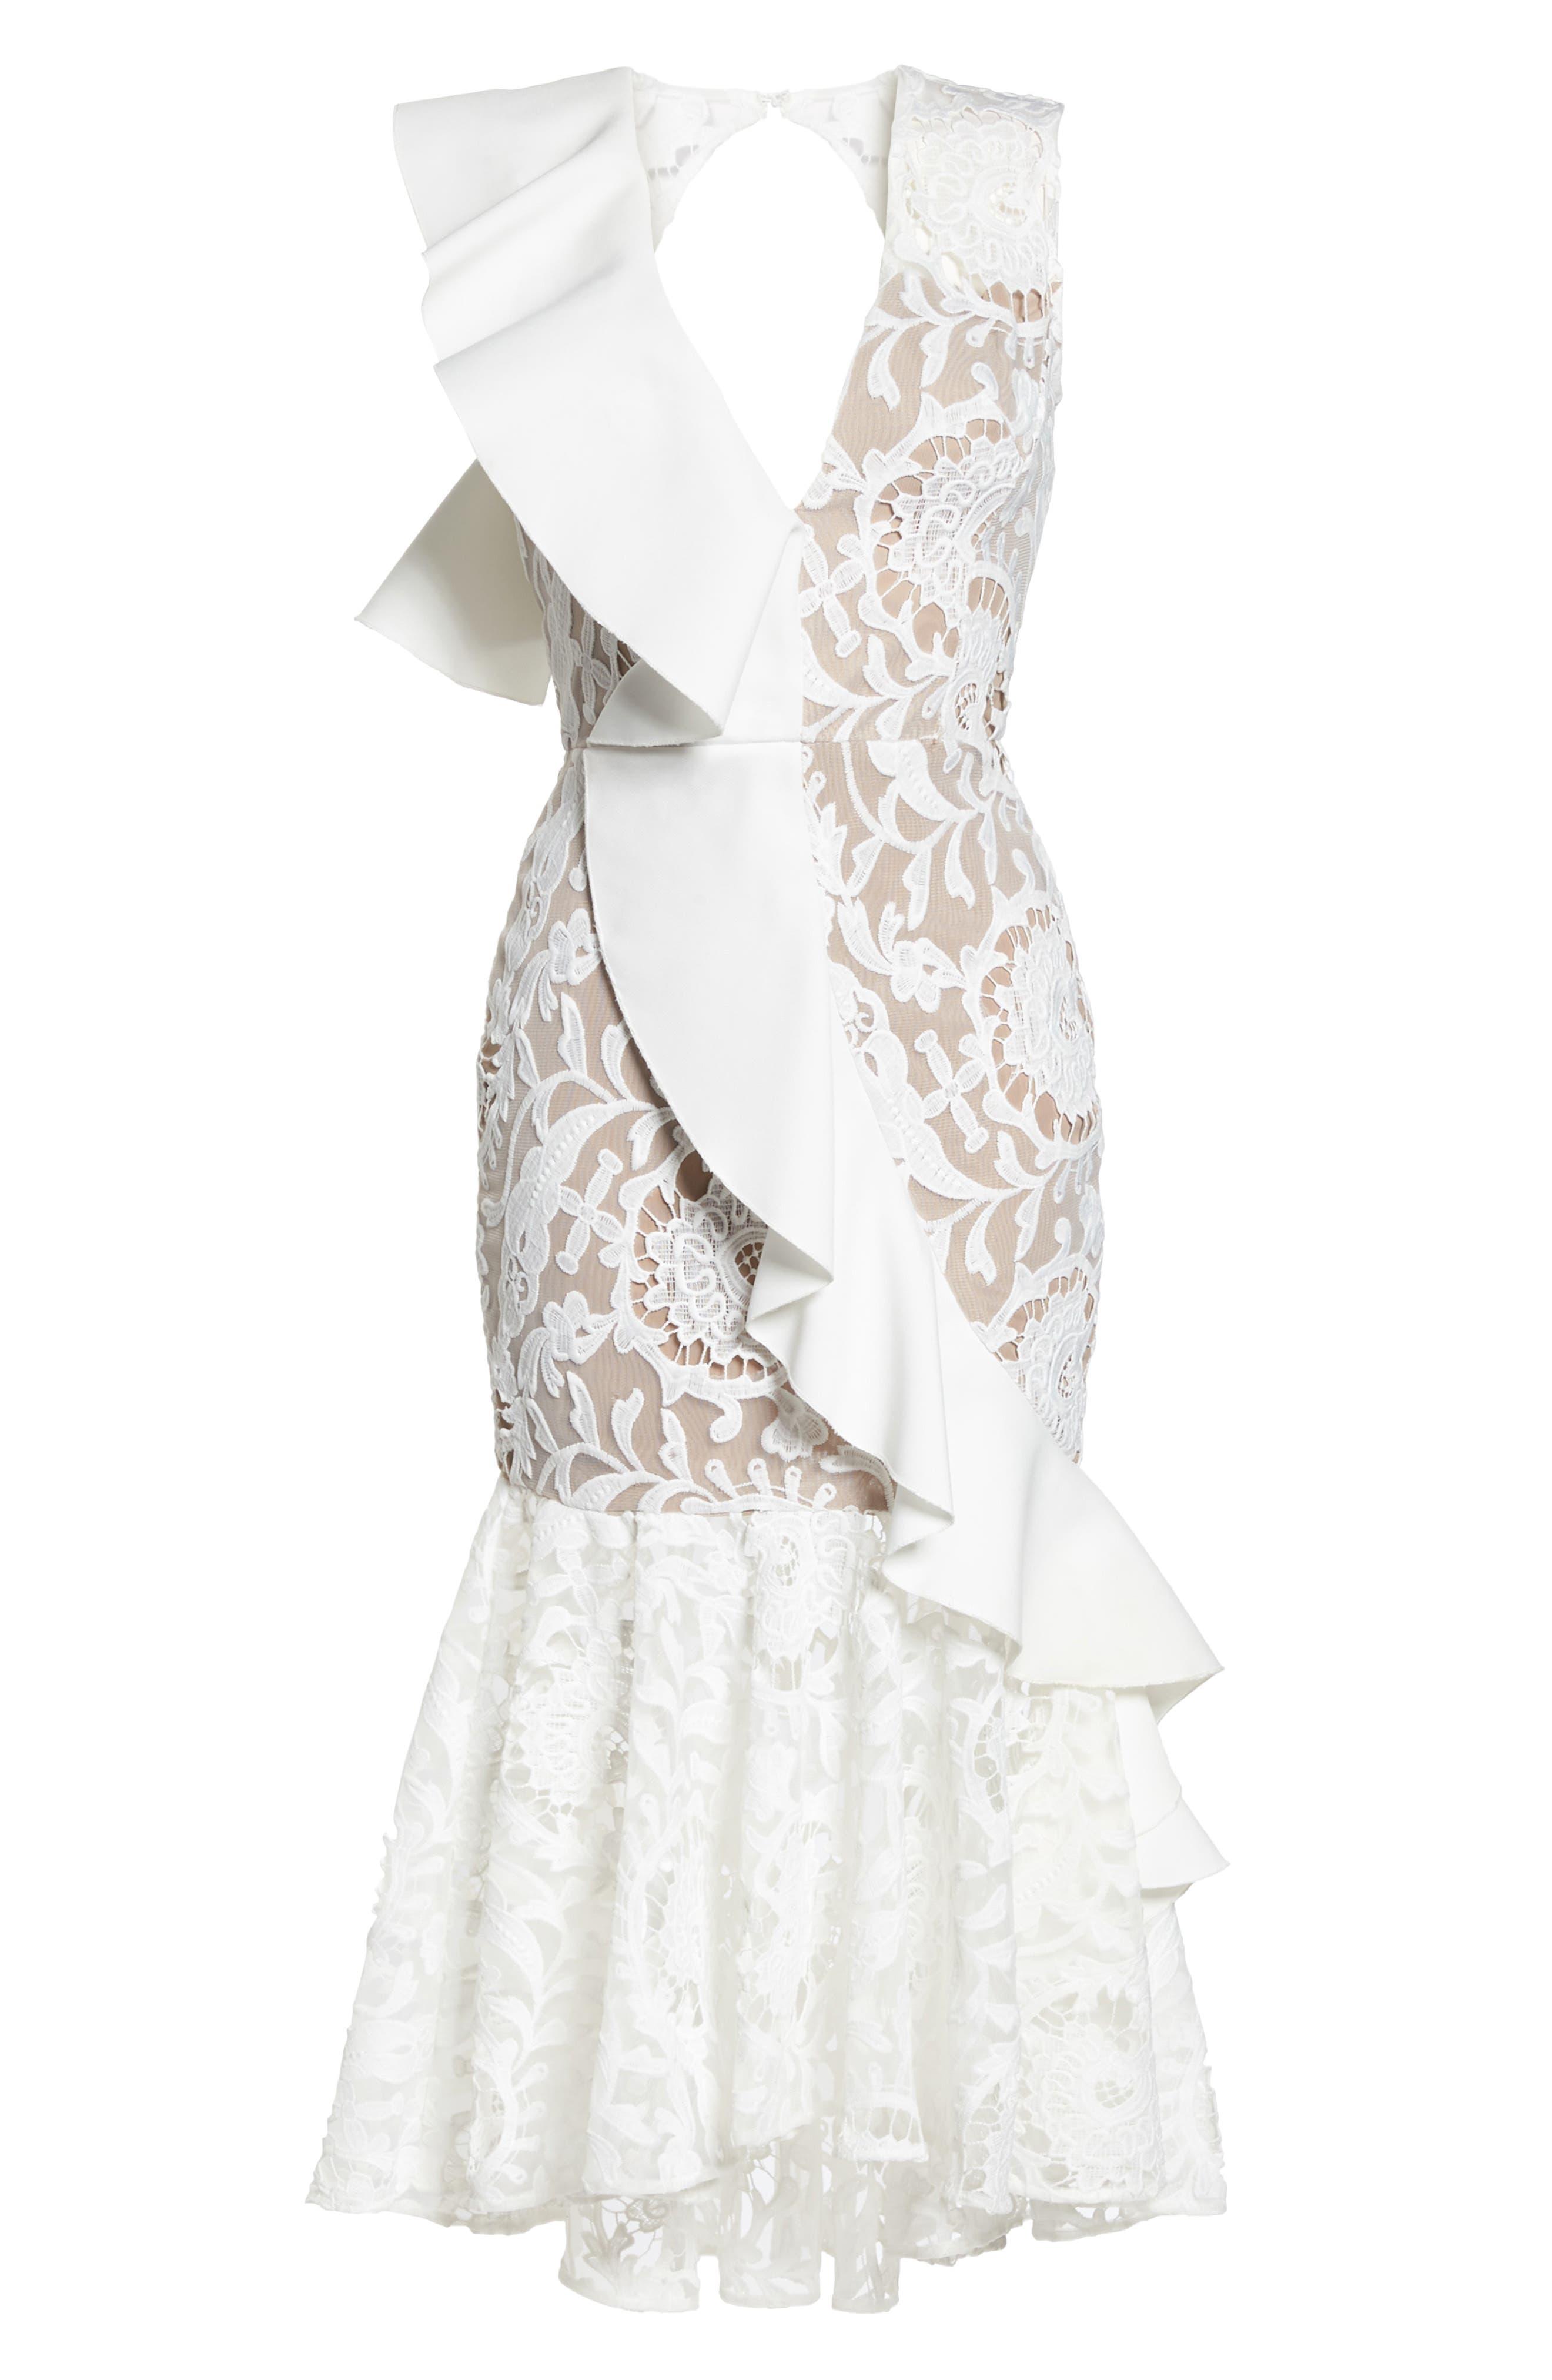 Rocha Waterfall Ruffle Lace Midi Dress,                             Alternate thumbnail 6, color,                             900